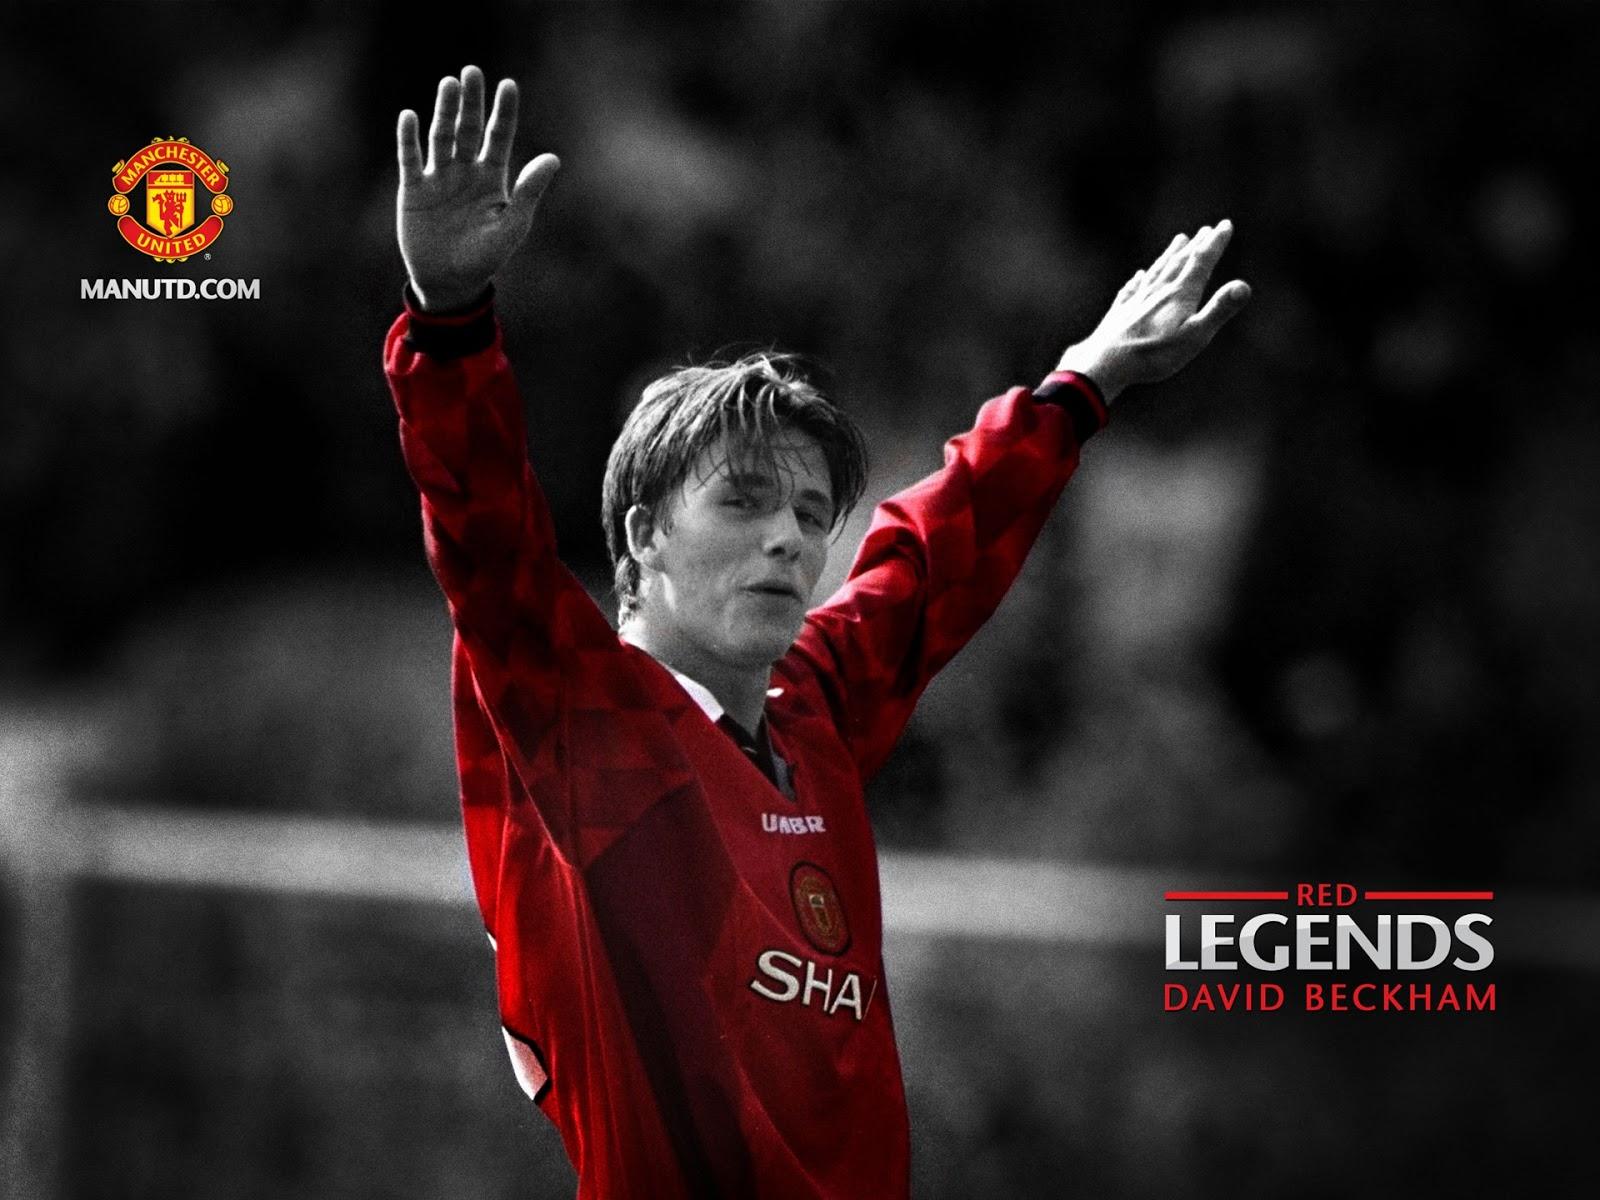 DavidBeckhamNet David Beckham Wallpaper Manchester United